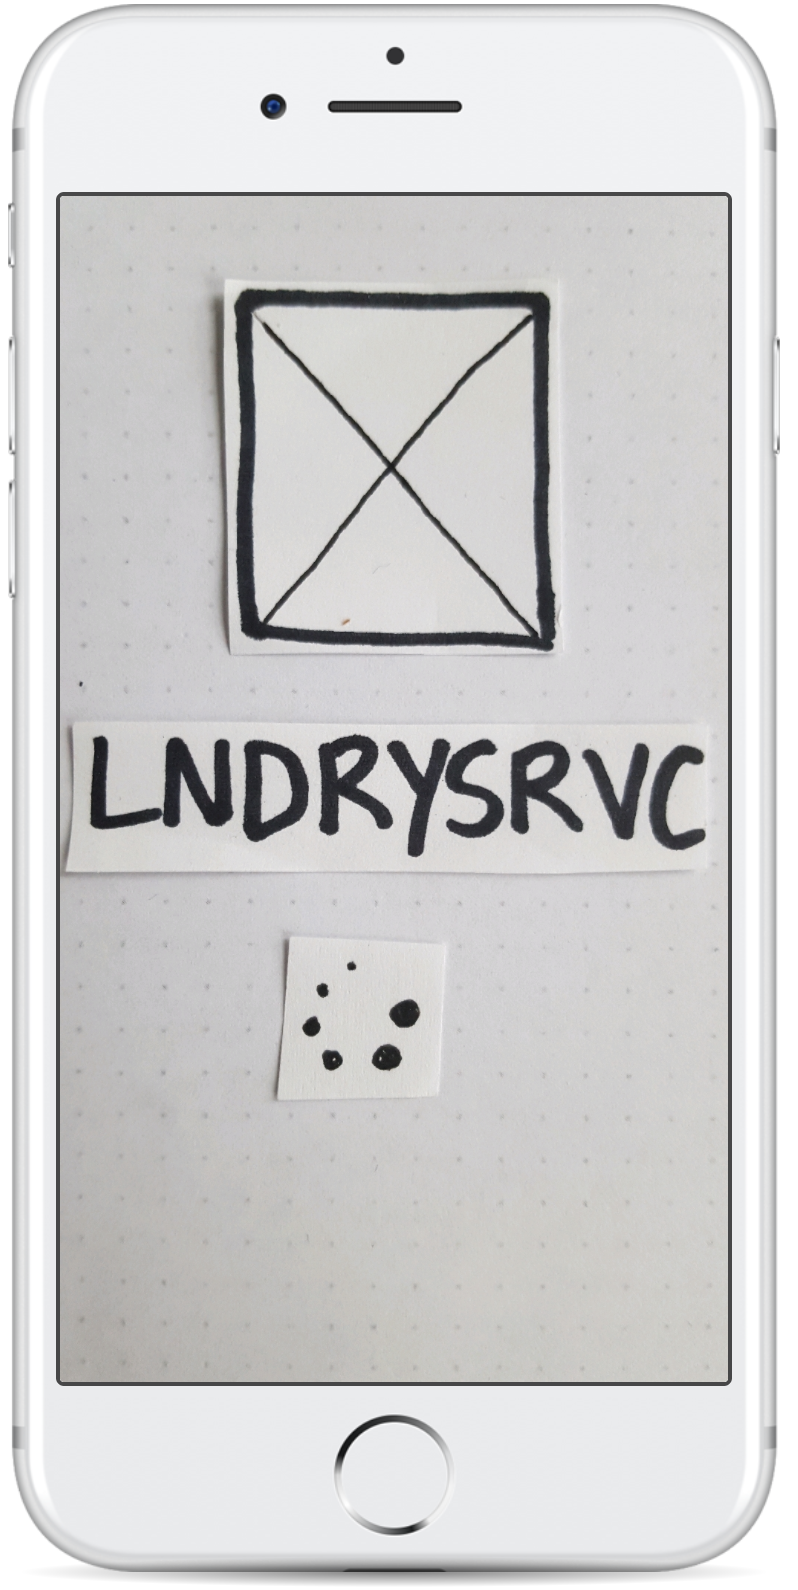 LNDRYSRVC Initial Prototype